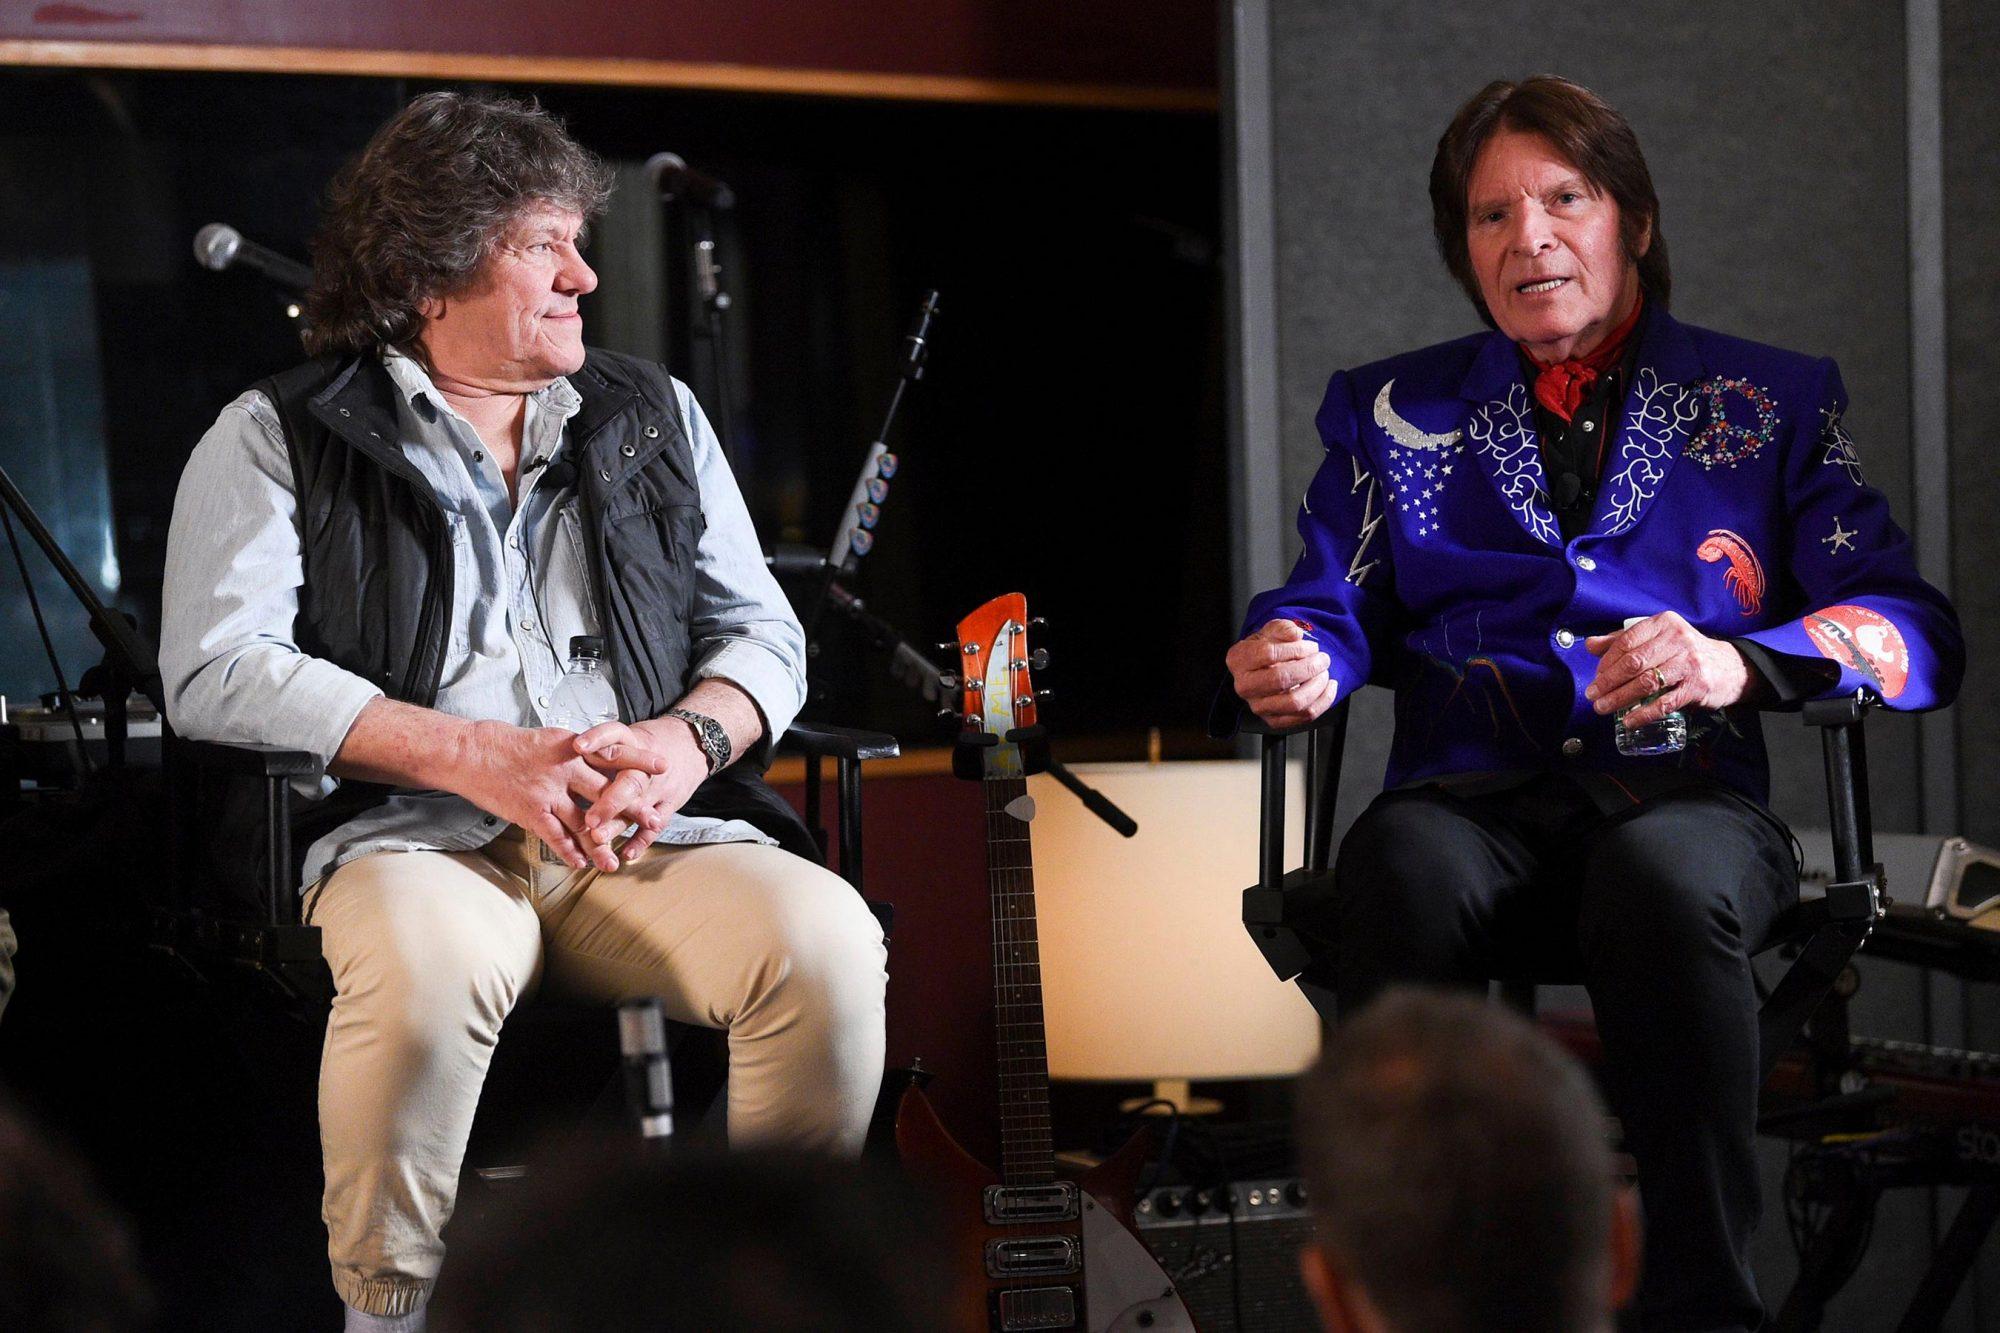 Woodstock 50 Lineup Announcement, New York, USA - 19 Mar 2019